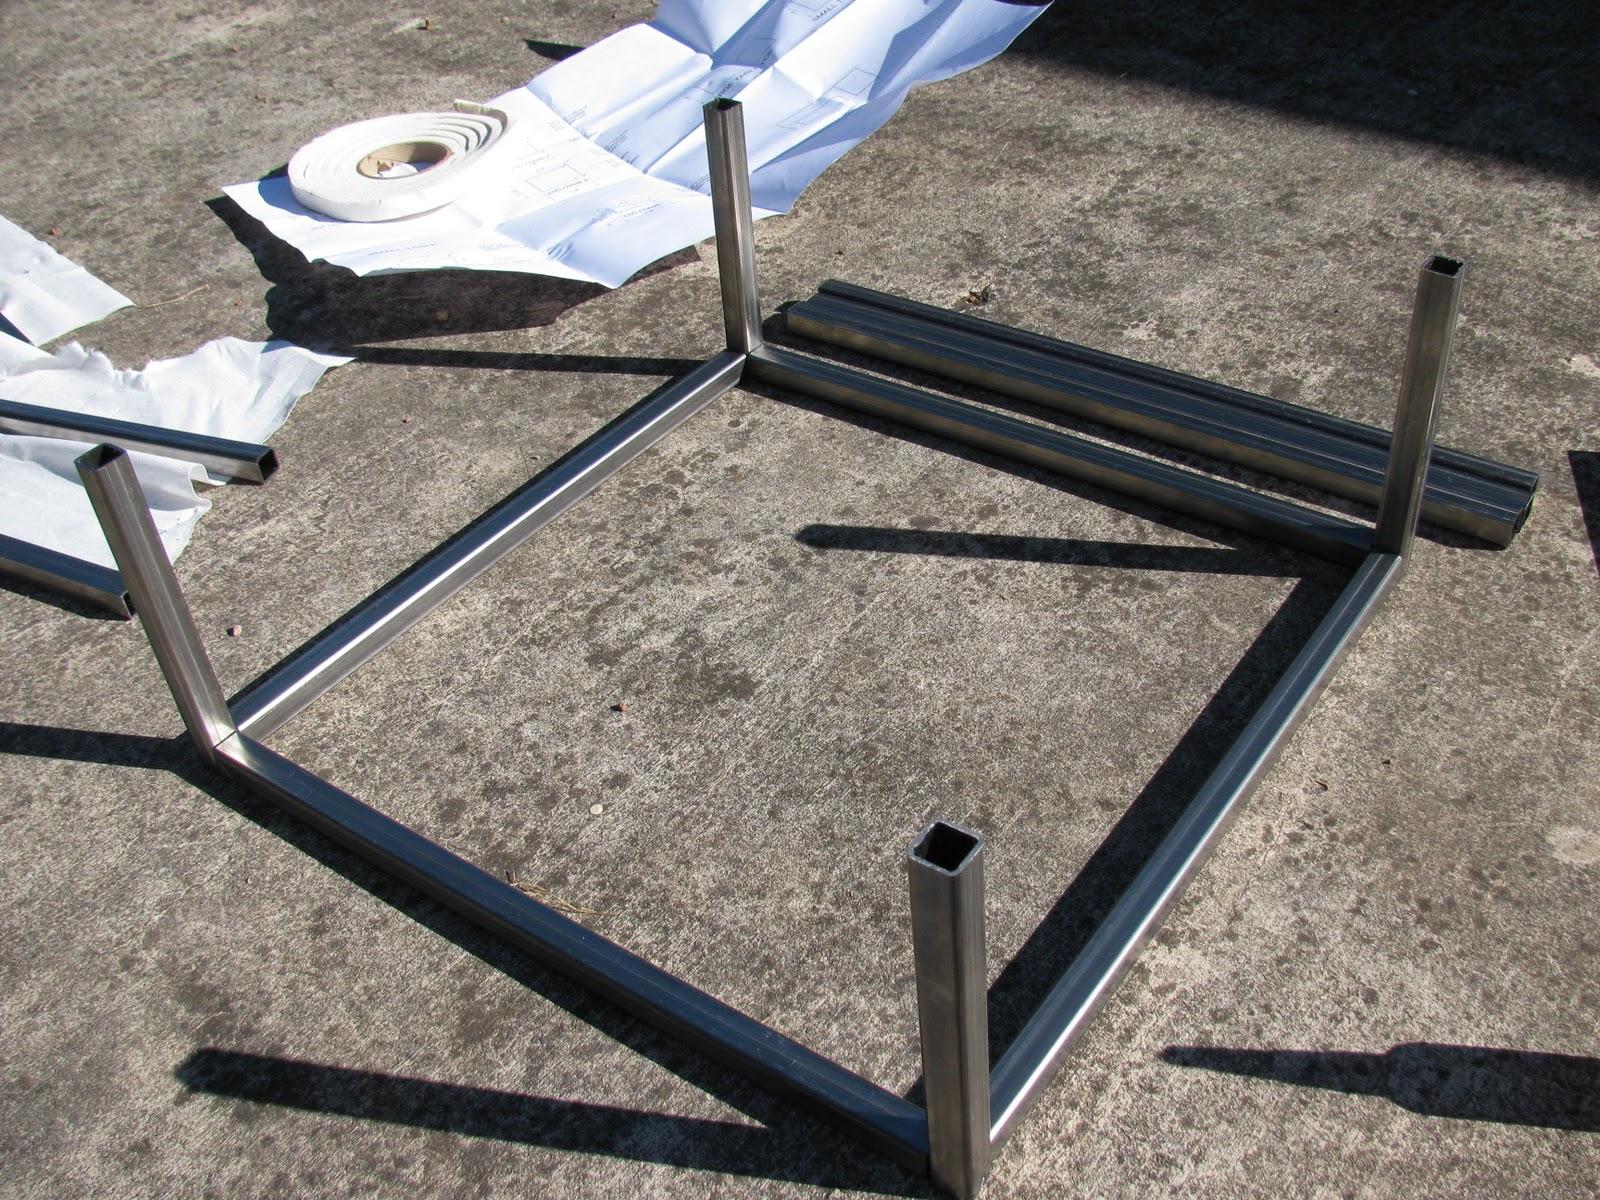 ... welding table welding table clamps diy welding table plans diy folding